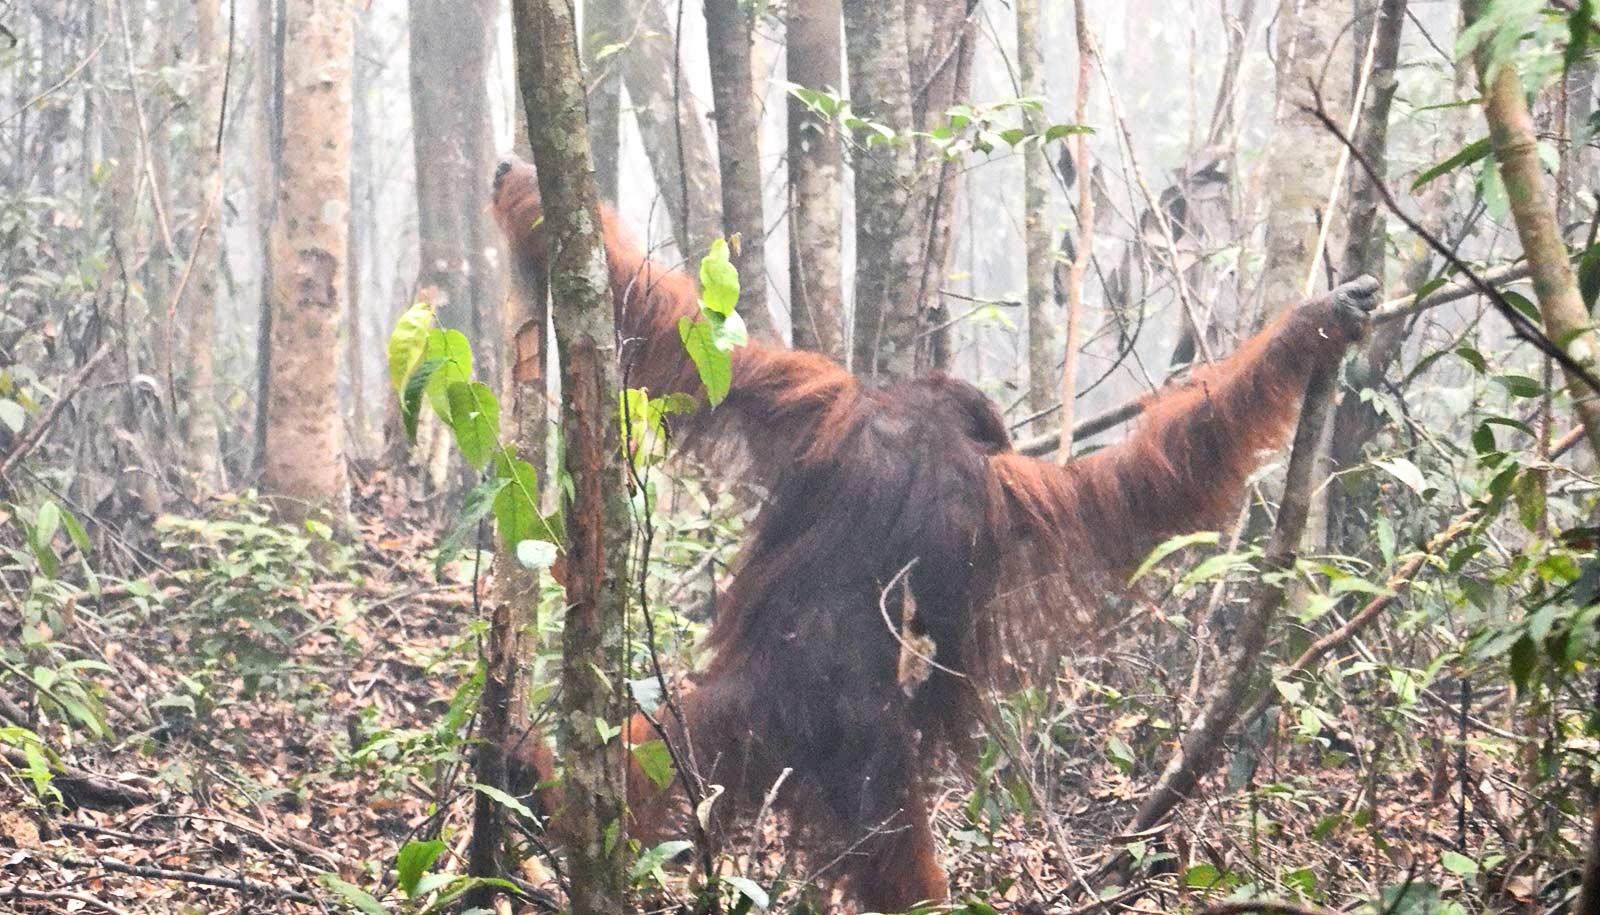 Orangutan in smokey forest